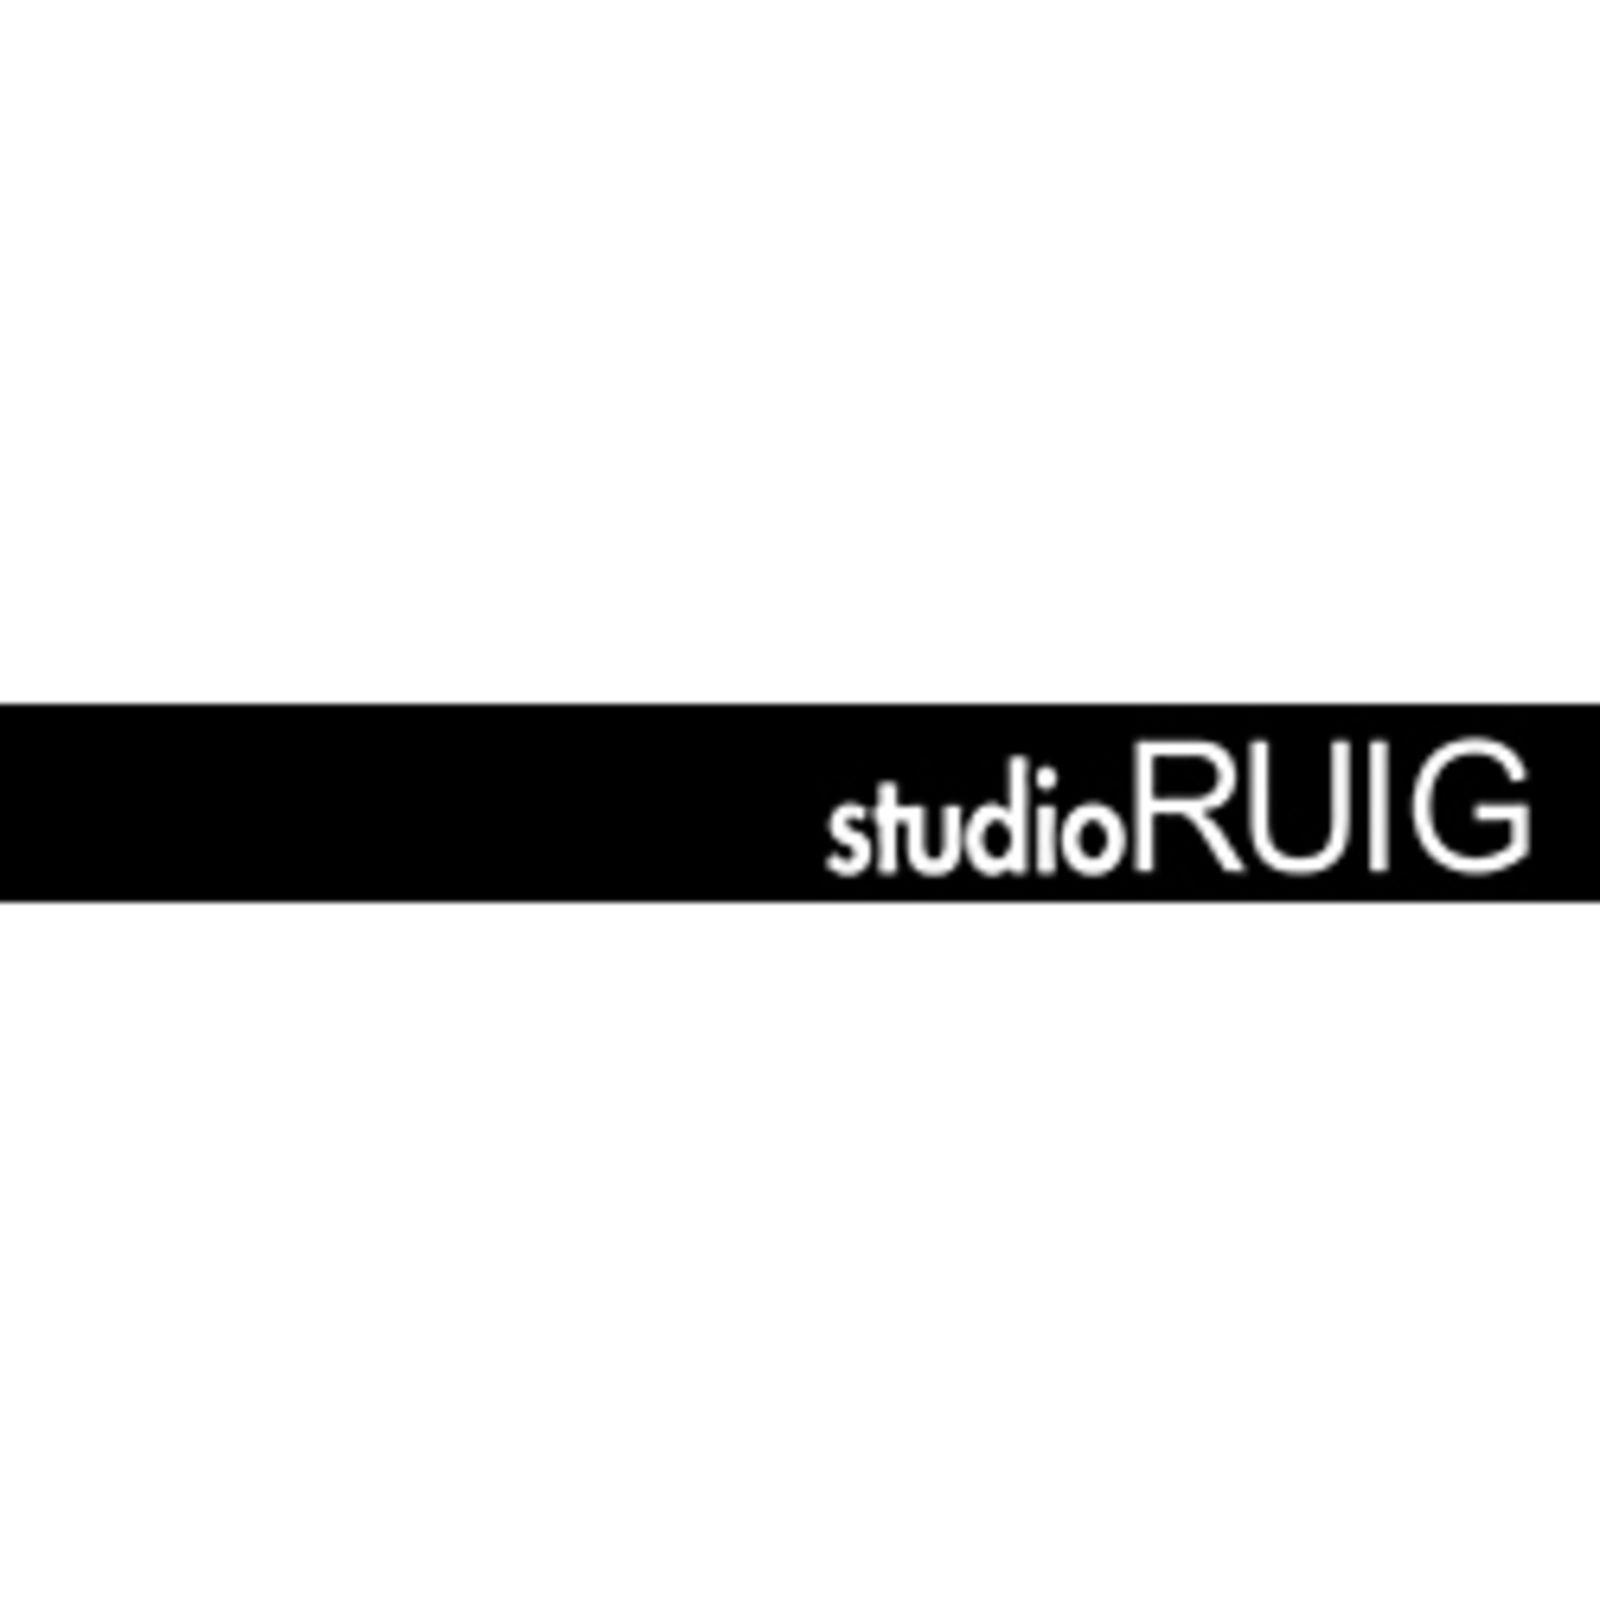 studio RUIG